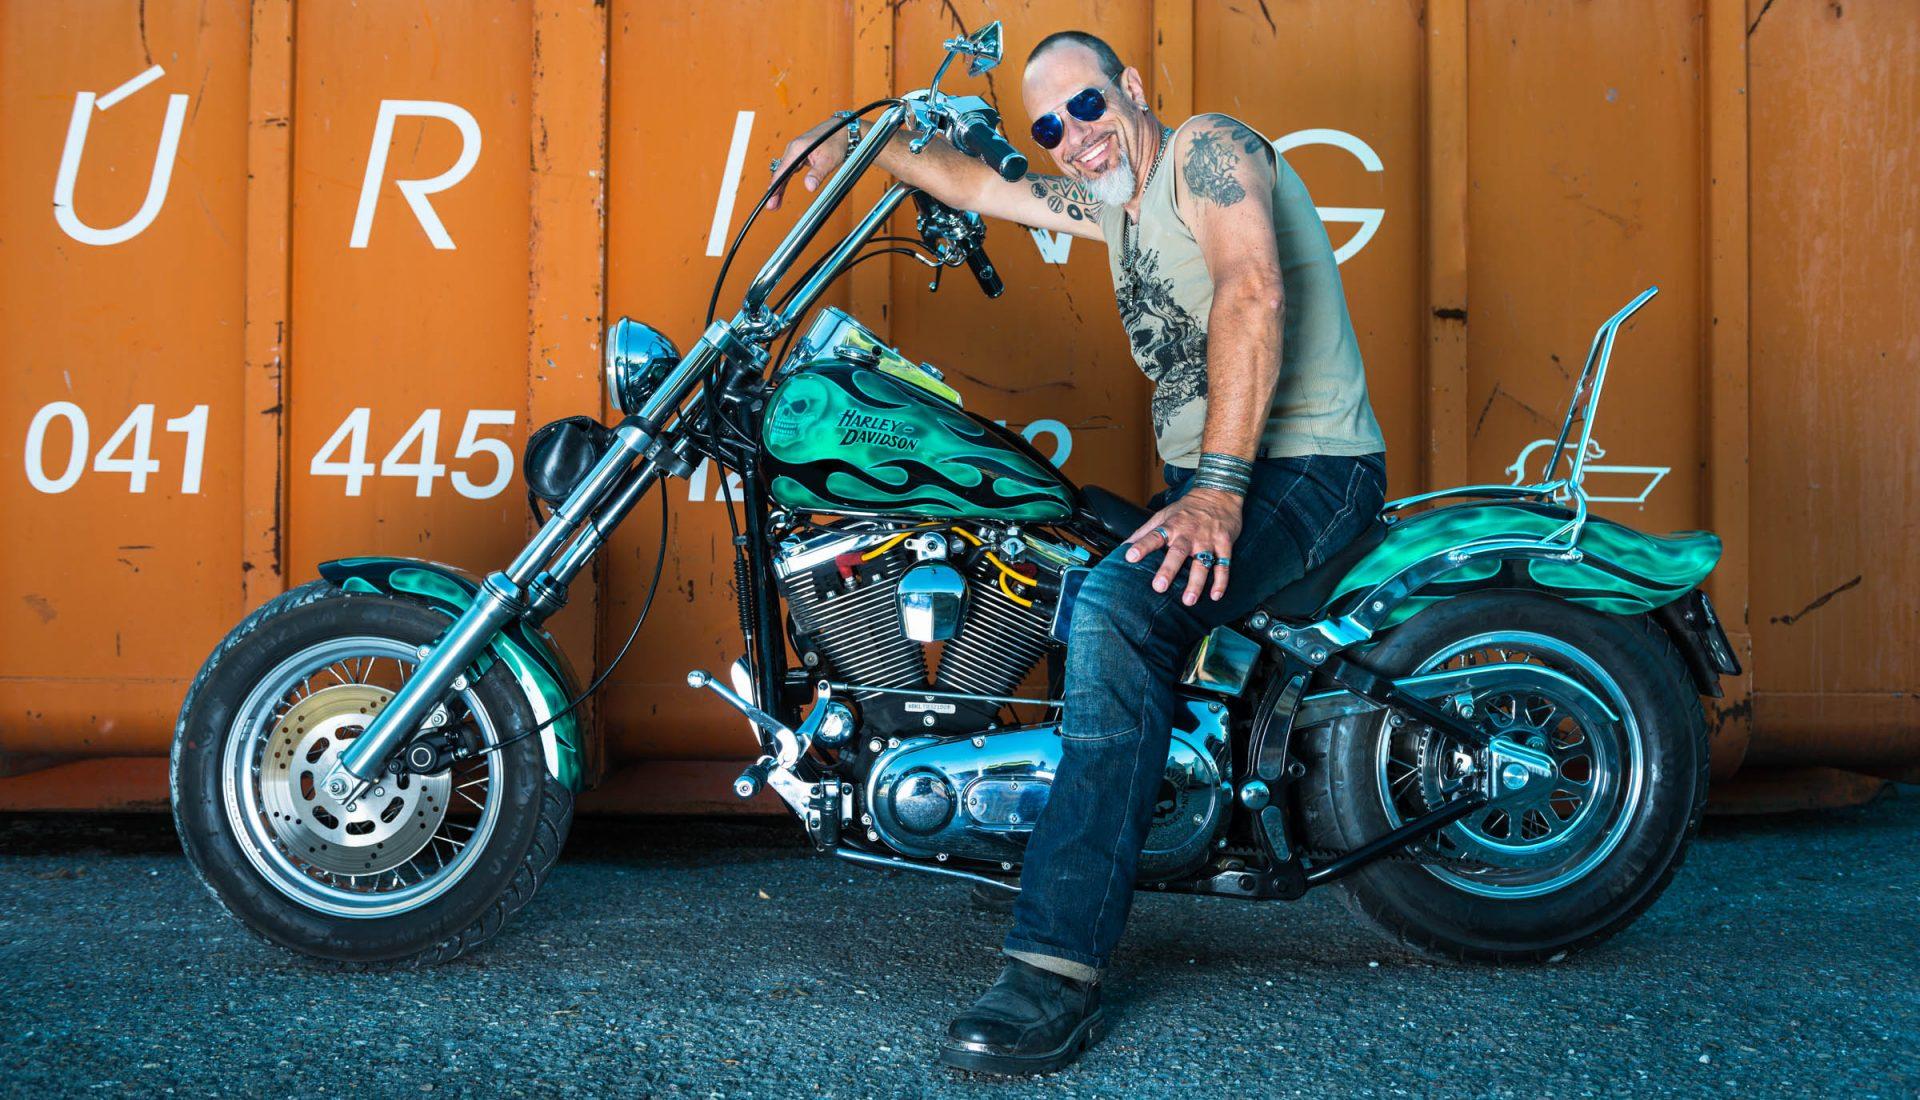 Werbefotograf, Editorialfotografie, Harley Davidson, fotograf-spitz